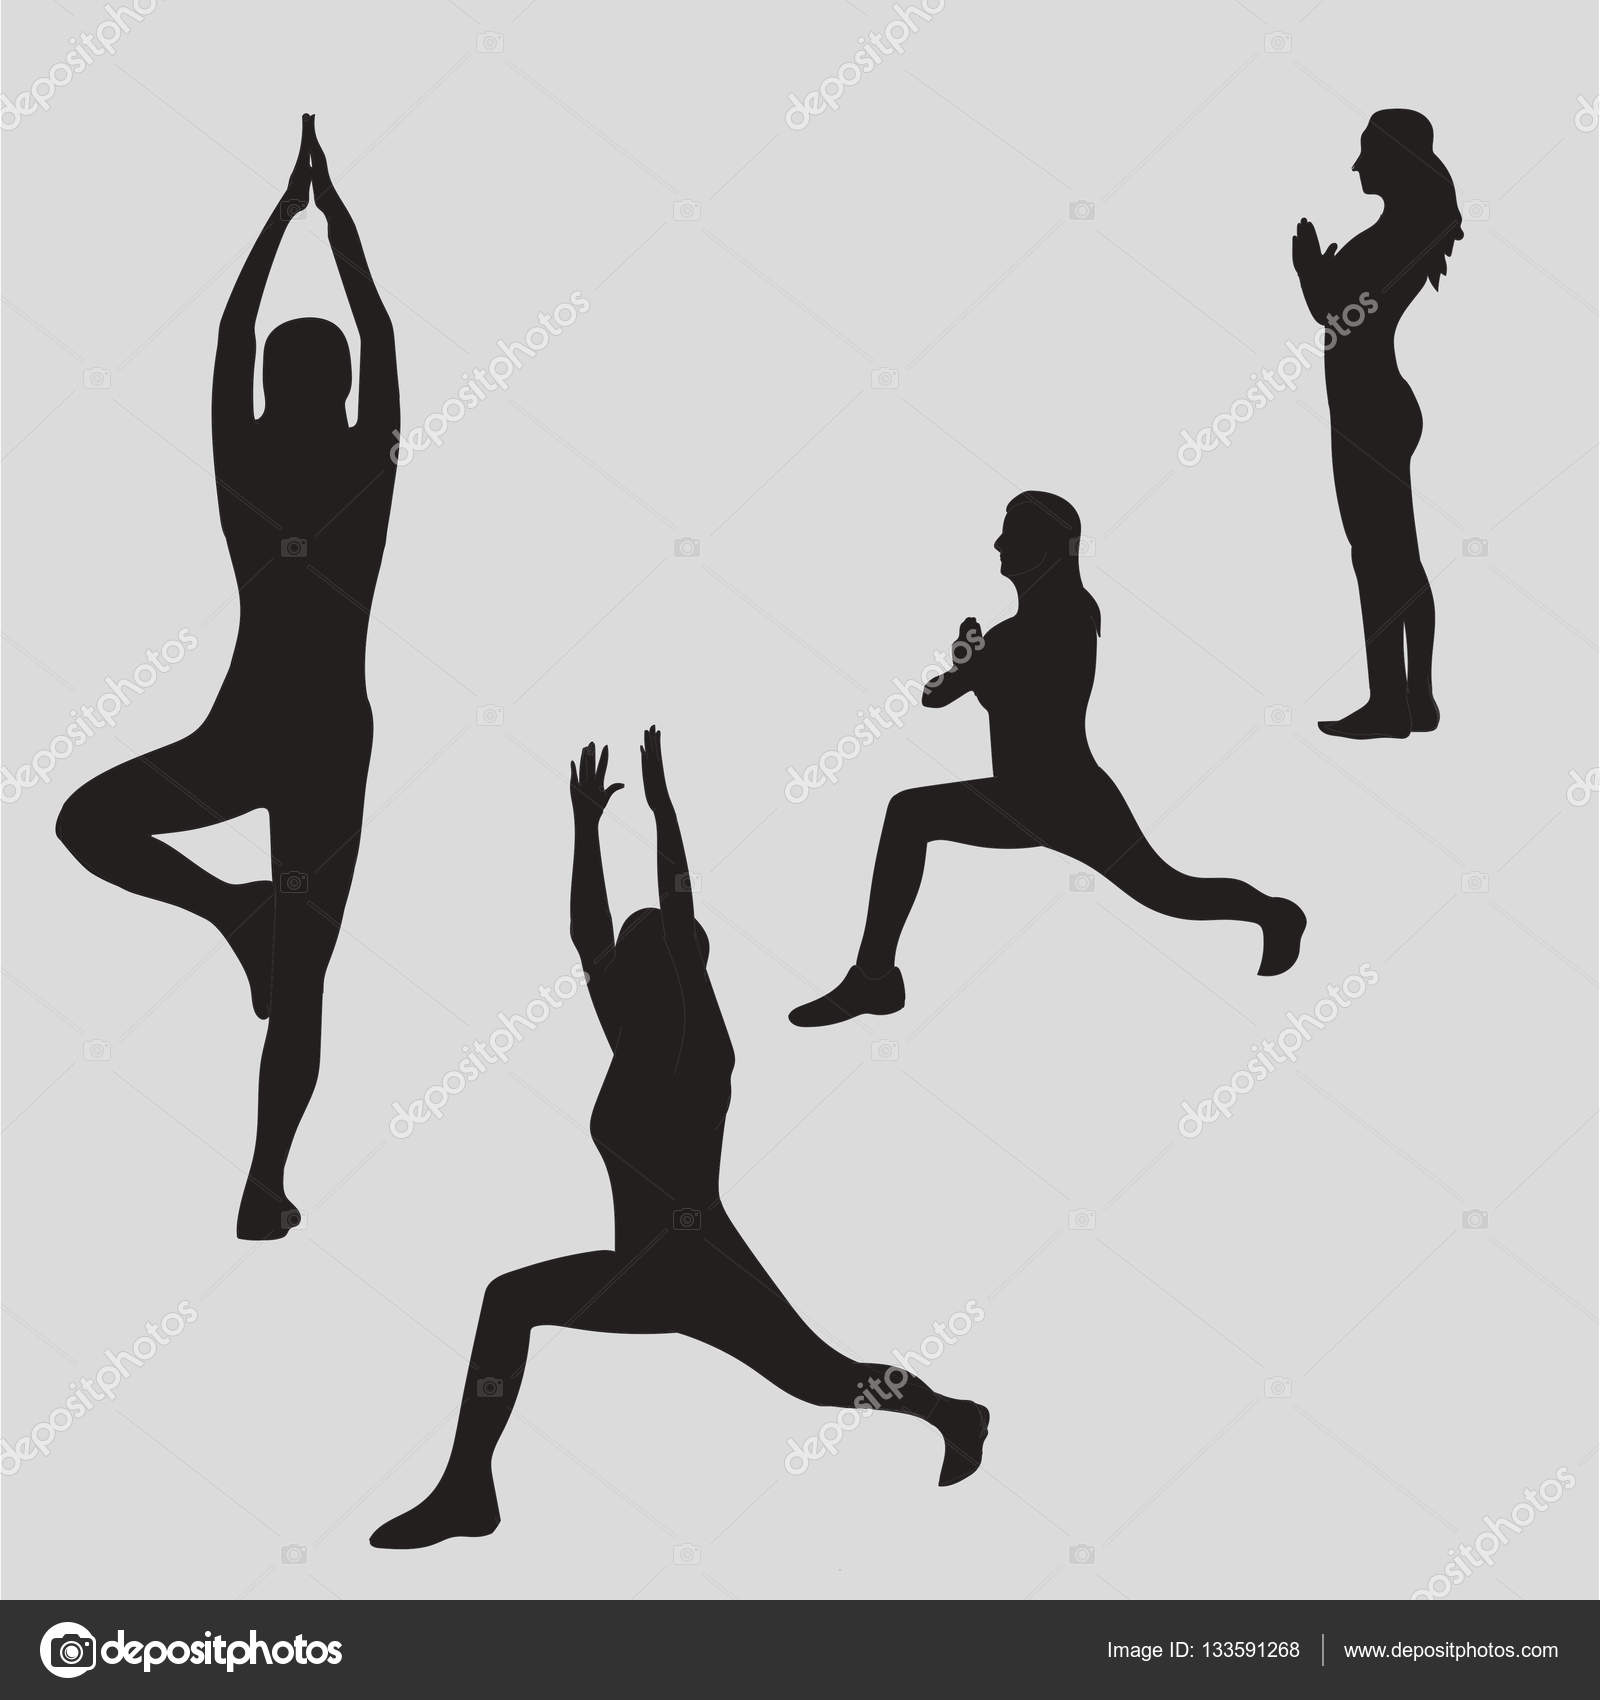 Woman Meditating In Different Yoga Poses Silhouette Zen Meditation Peace Warrior Tree Namaste Vector Illustration